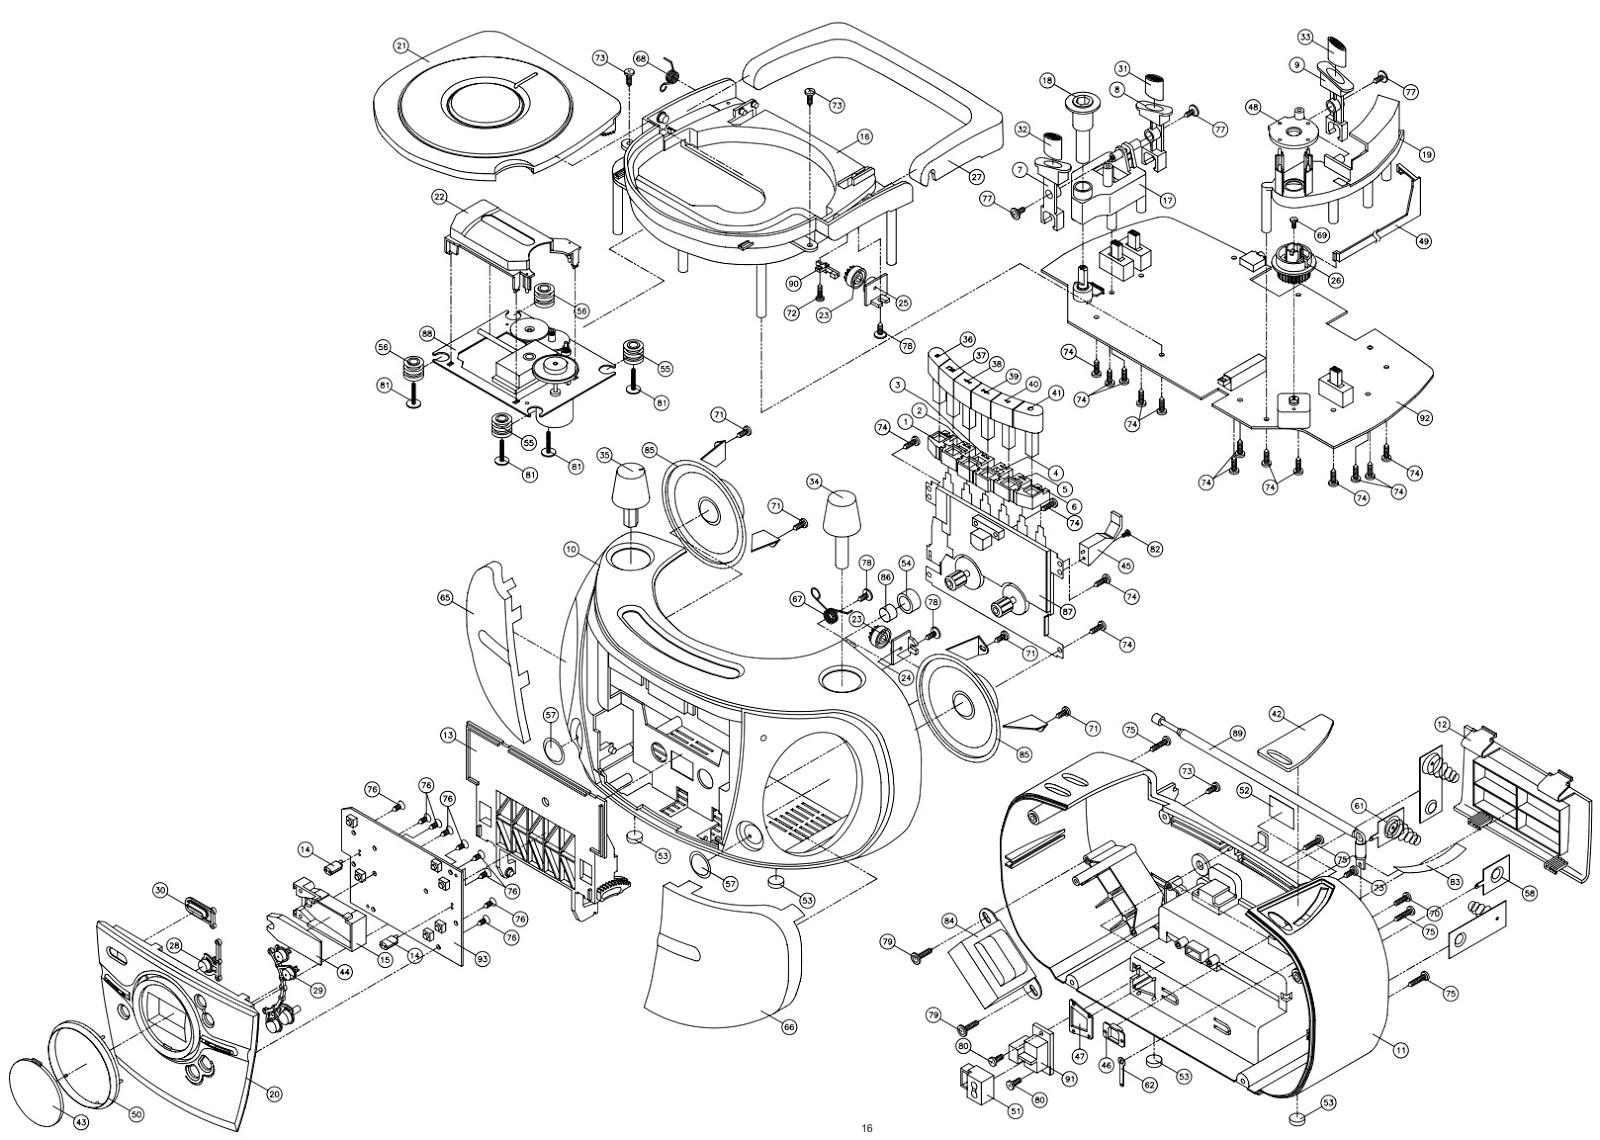 silva schneider pcd136 circuit diagram  u2013 portable mw